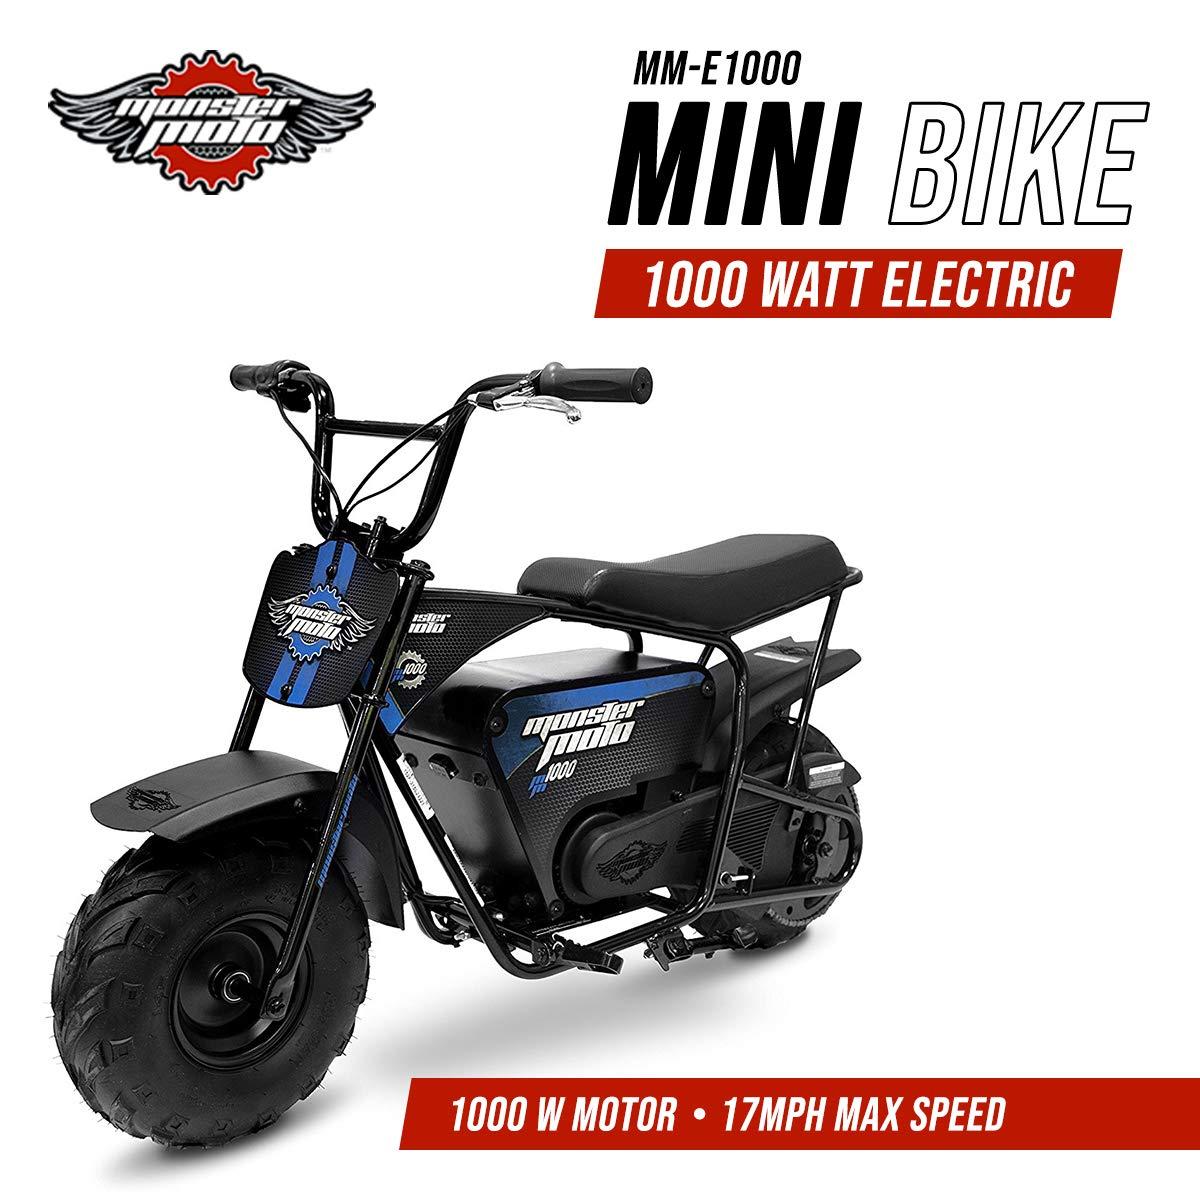 Amazon.com: Monster Moto MM-E1000-BB Electric Mini Bike, Assembled in the  USA (1000Watt, Blue/Black): Automotive